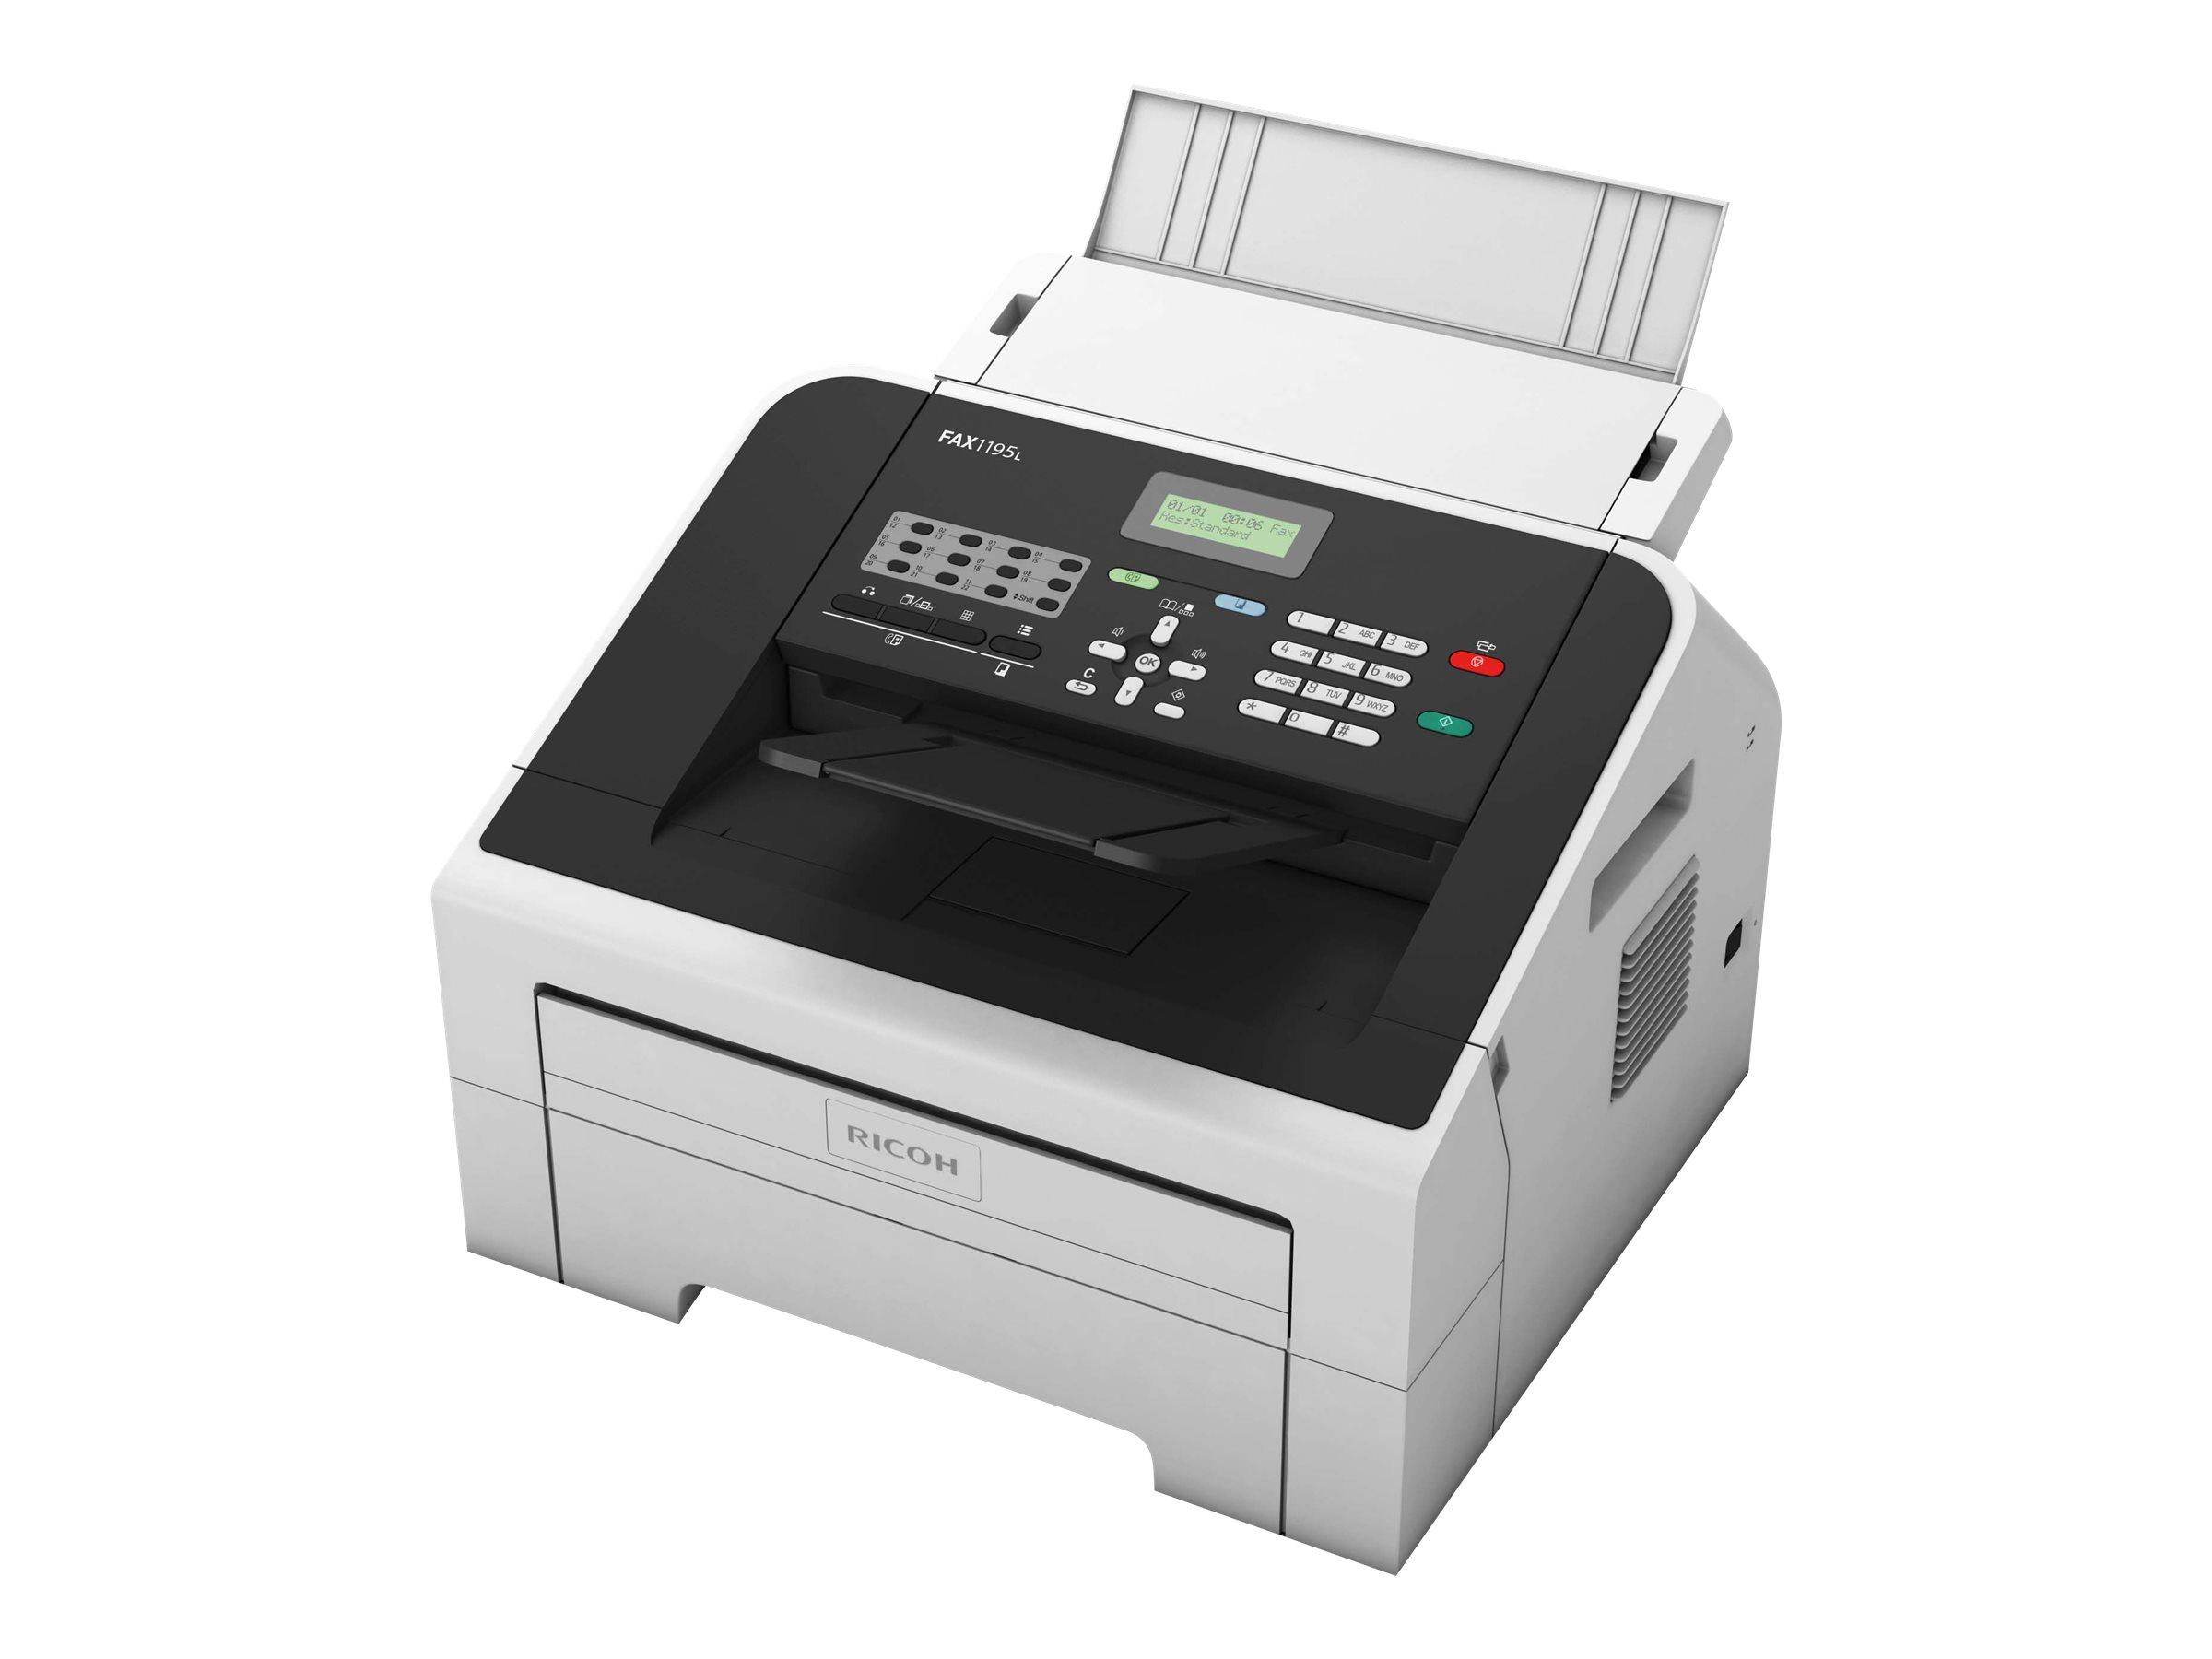 Ricoh FAX 1195L - Multifunktionsdrucker - s/w - Laser - A4 (210 x 297 mm) (Original) - A4/Legal (Medien)